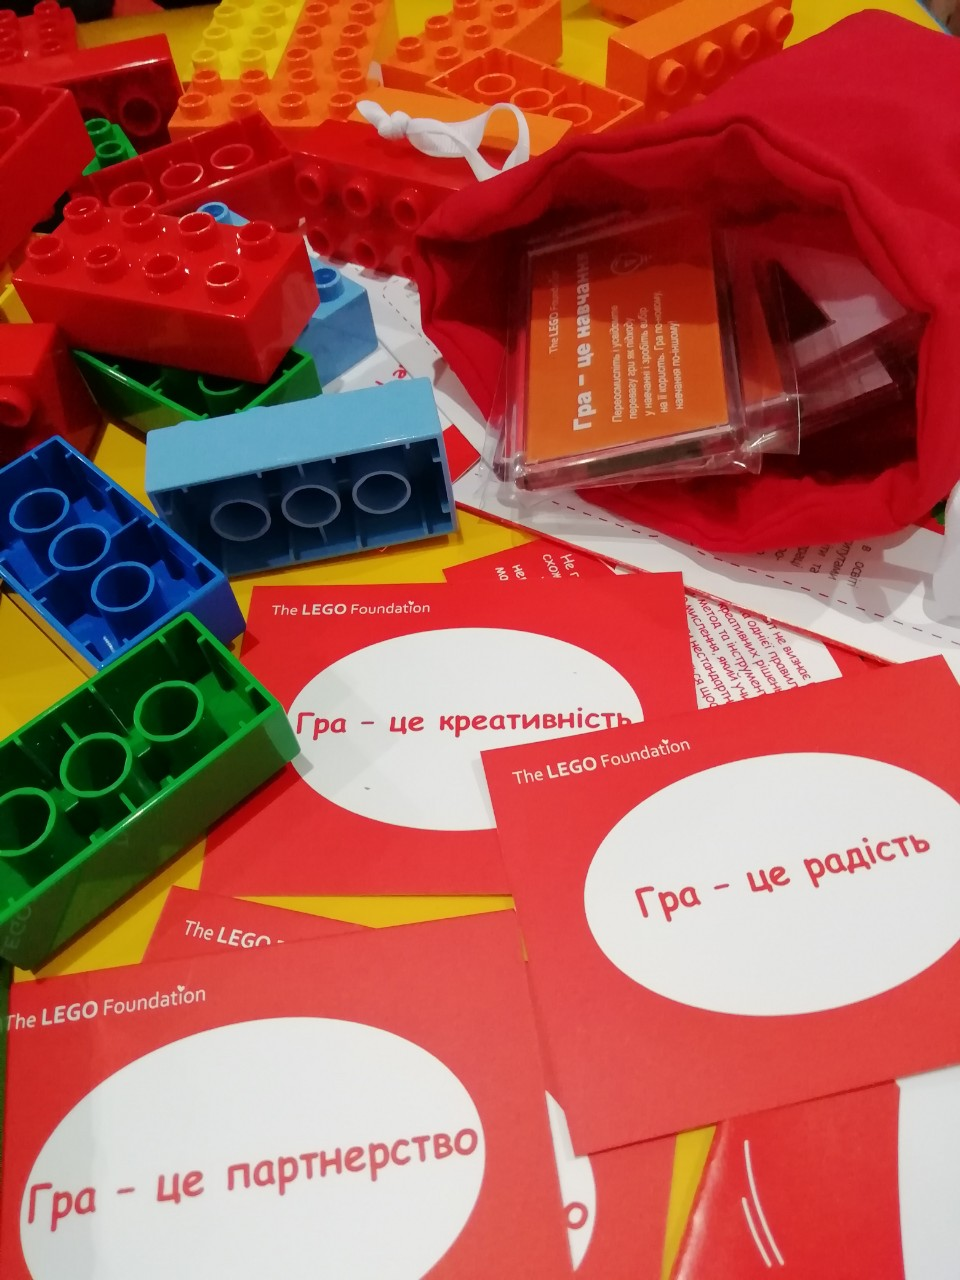 LEGO Foundation